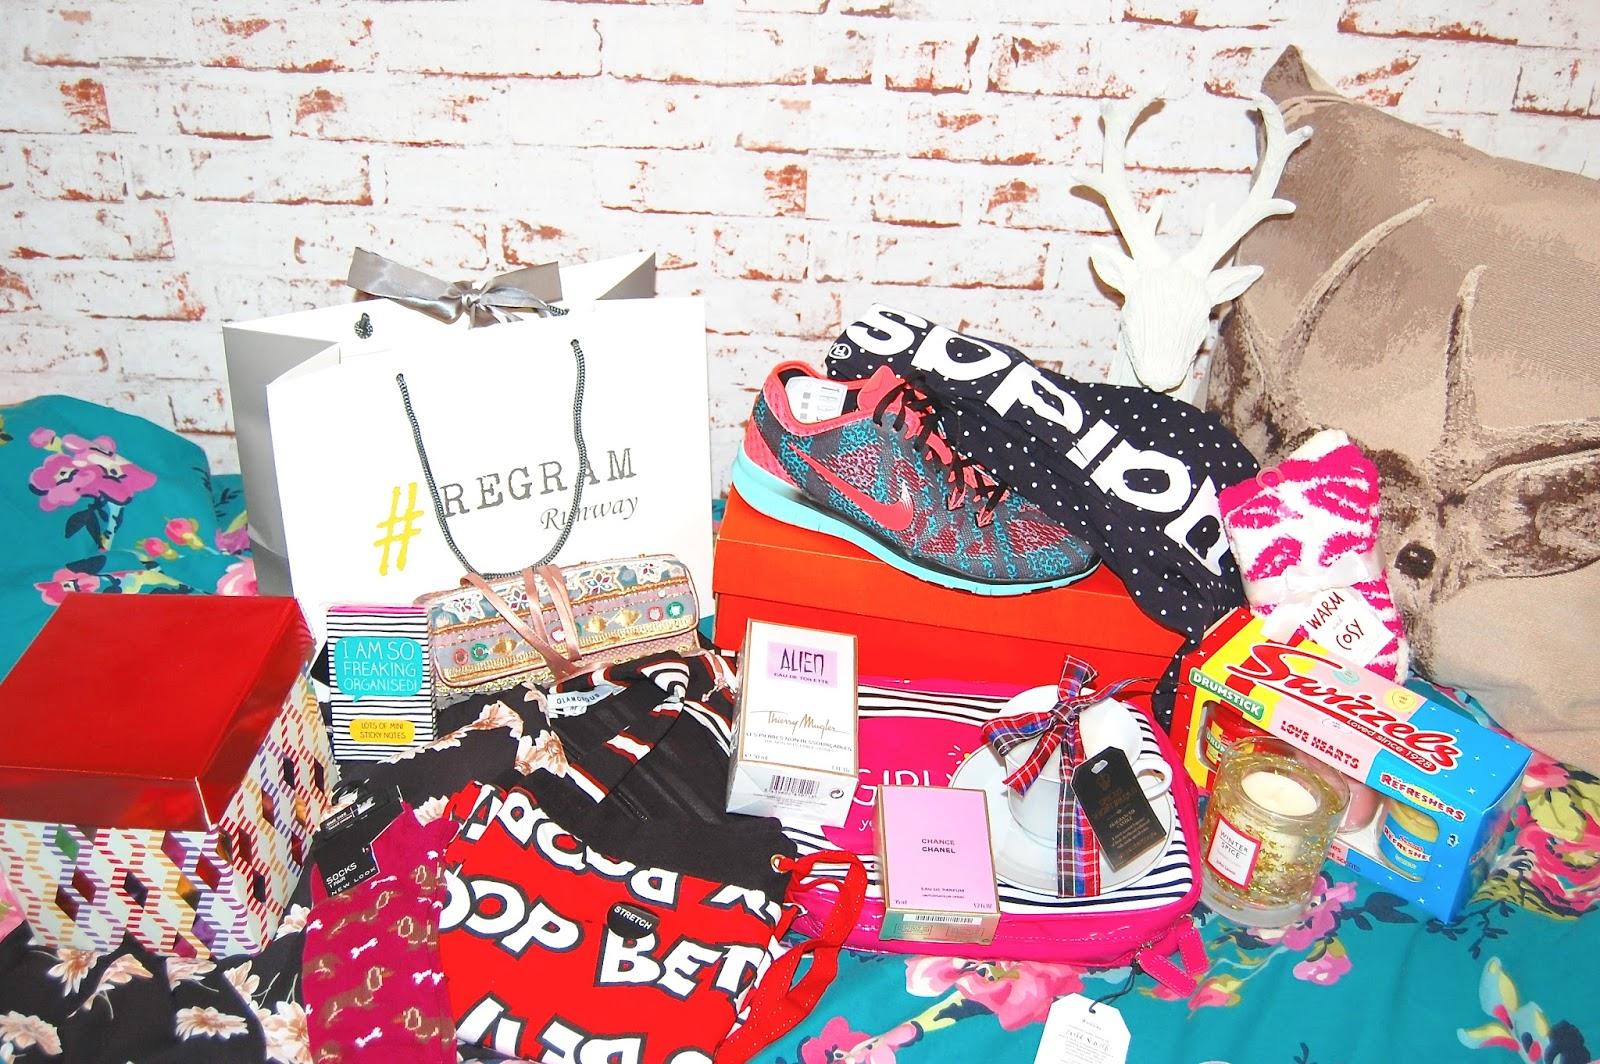 Christmas Presents, Regram Runway, Lush Cosmetics, Nike